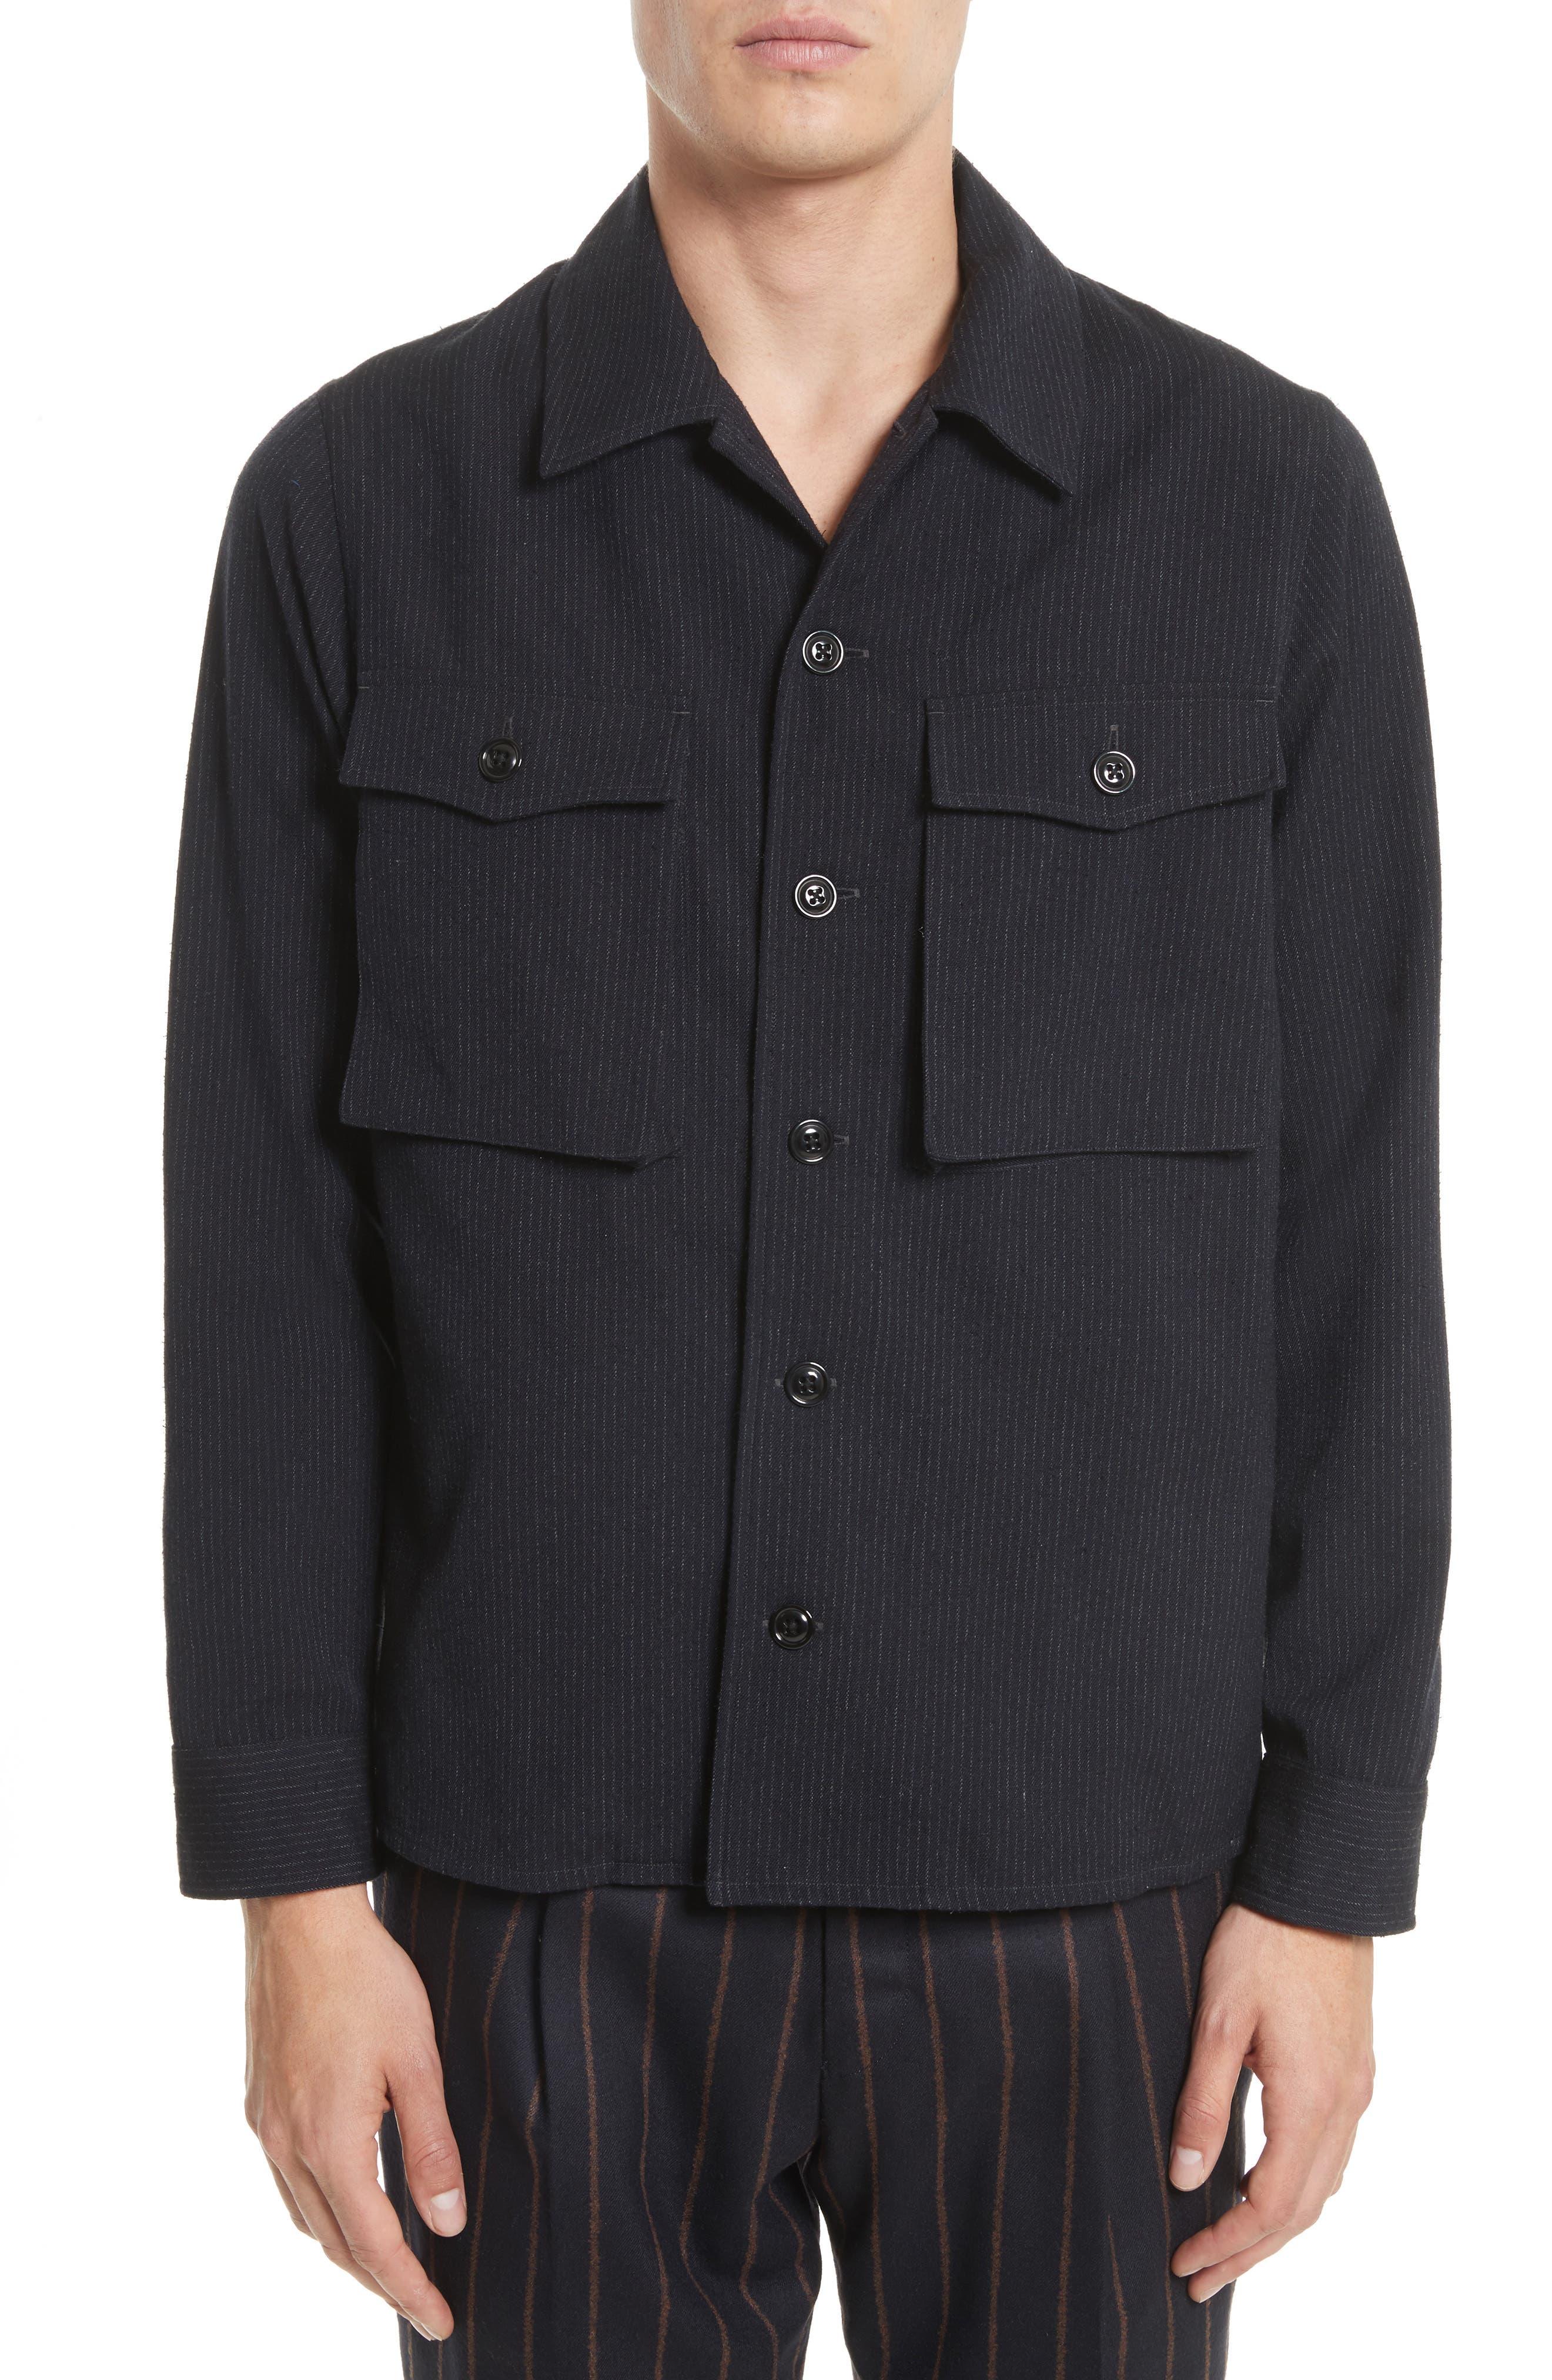 Tomorrowland Pinstripe Flannel Shirt Jacket